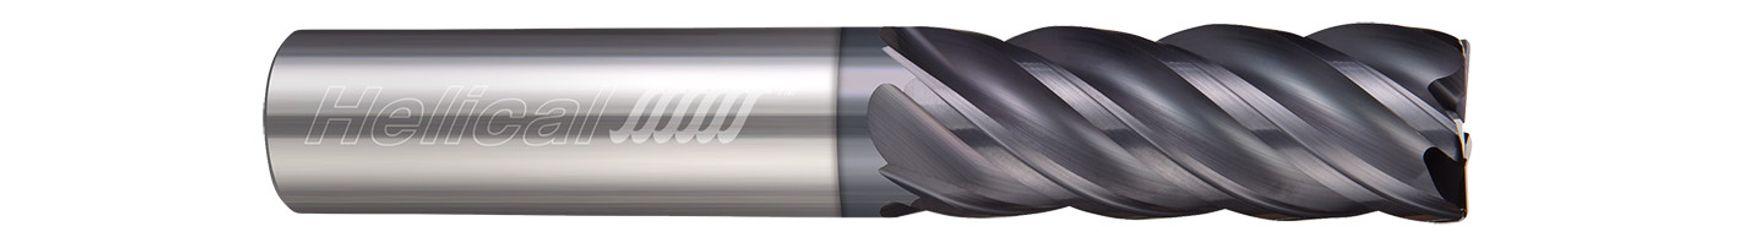 tool-details-45183